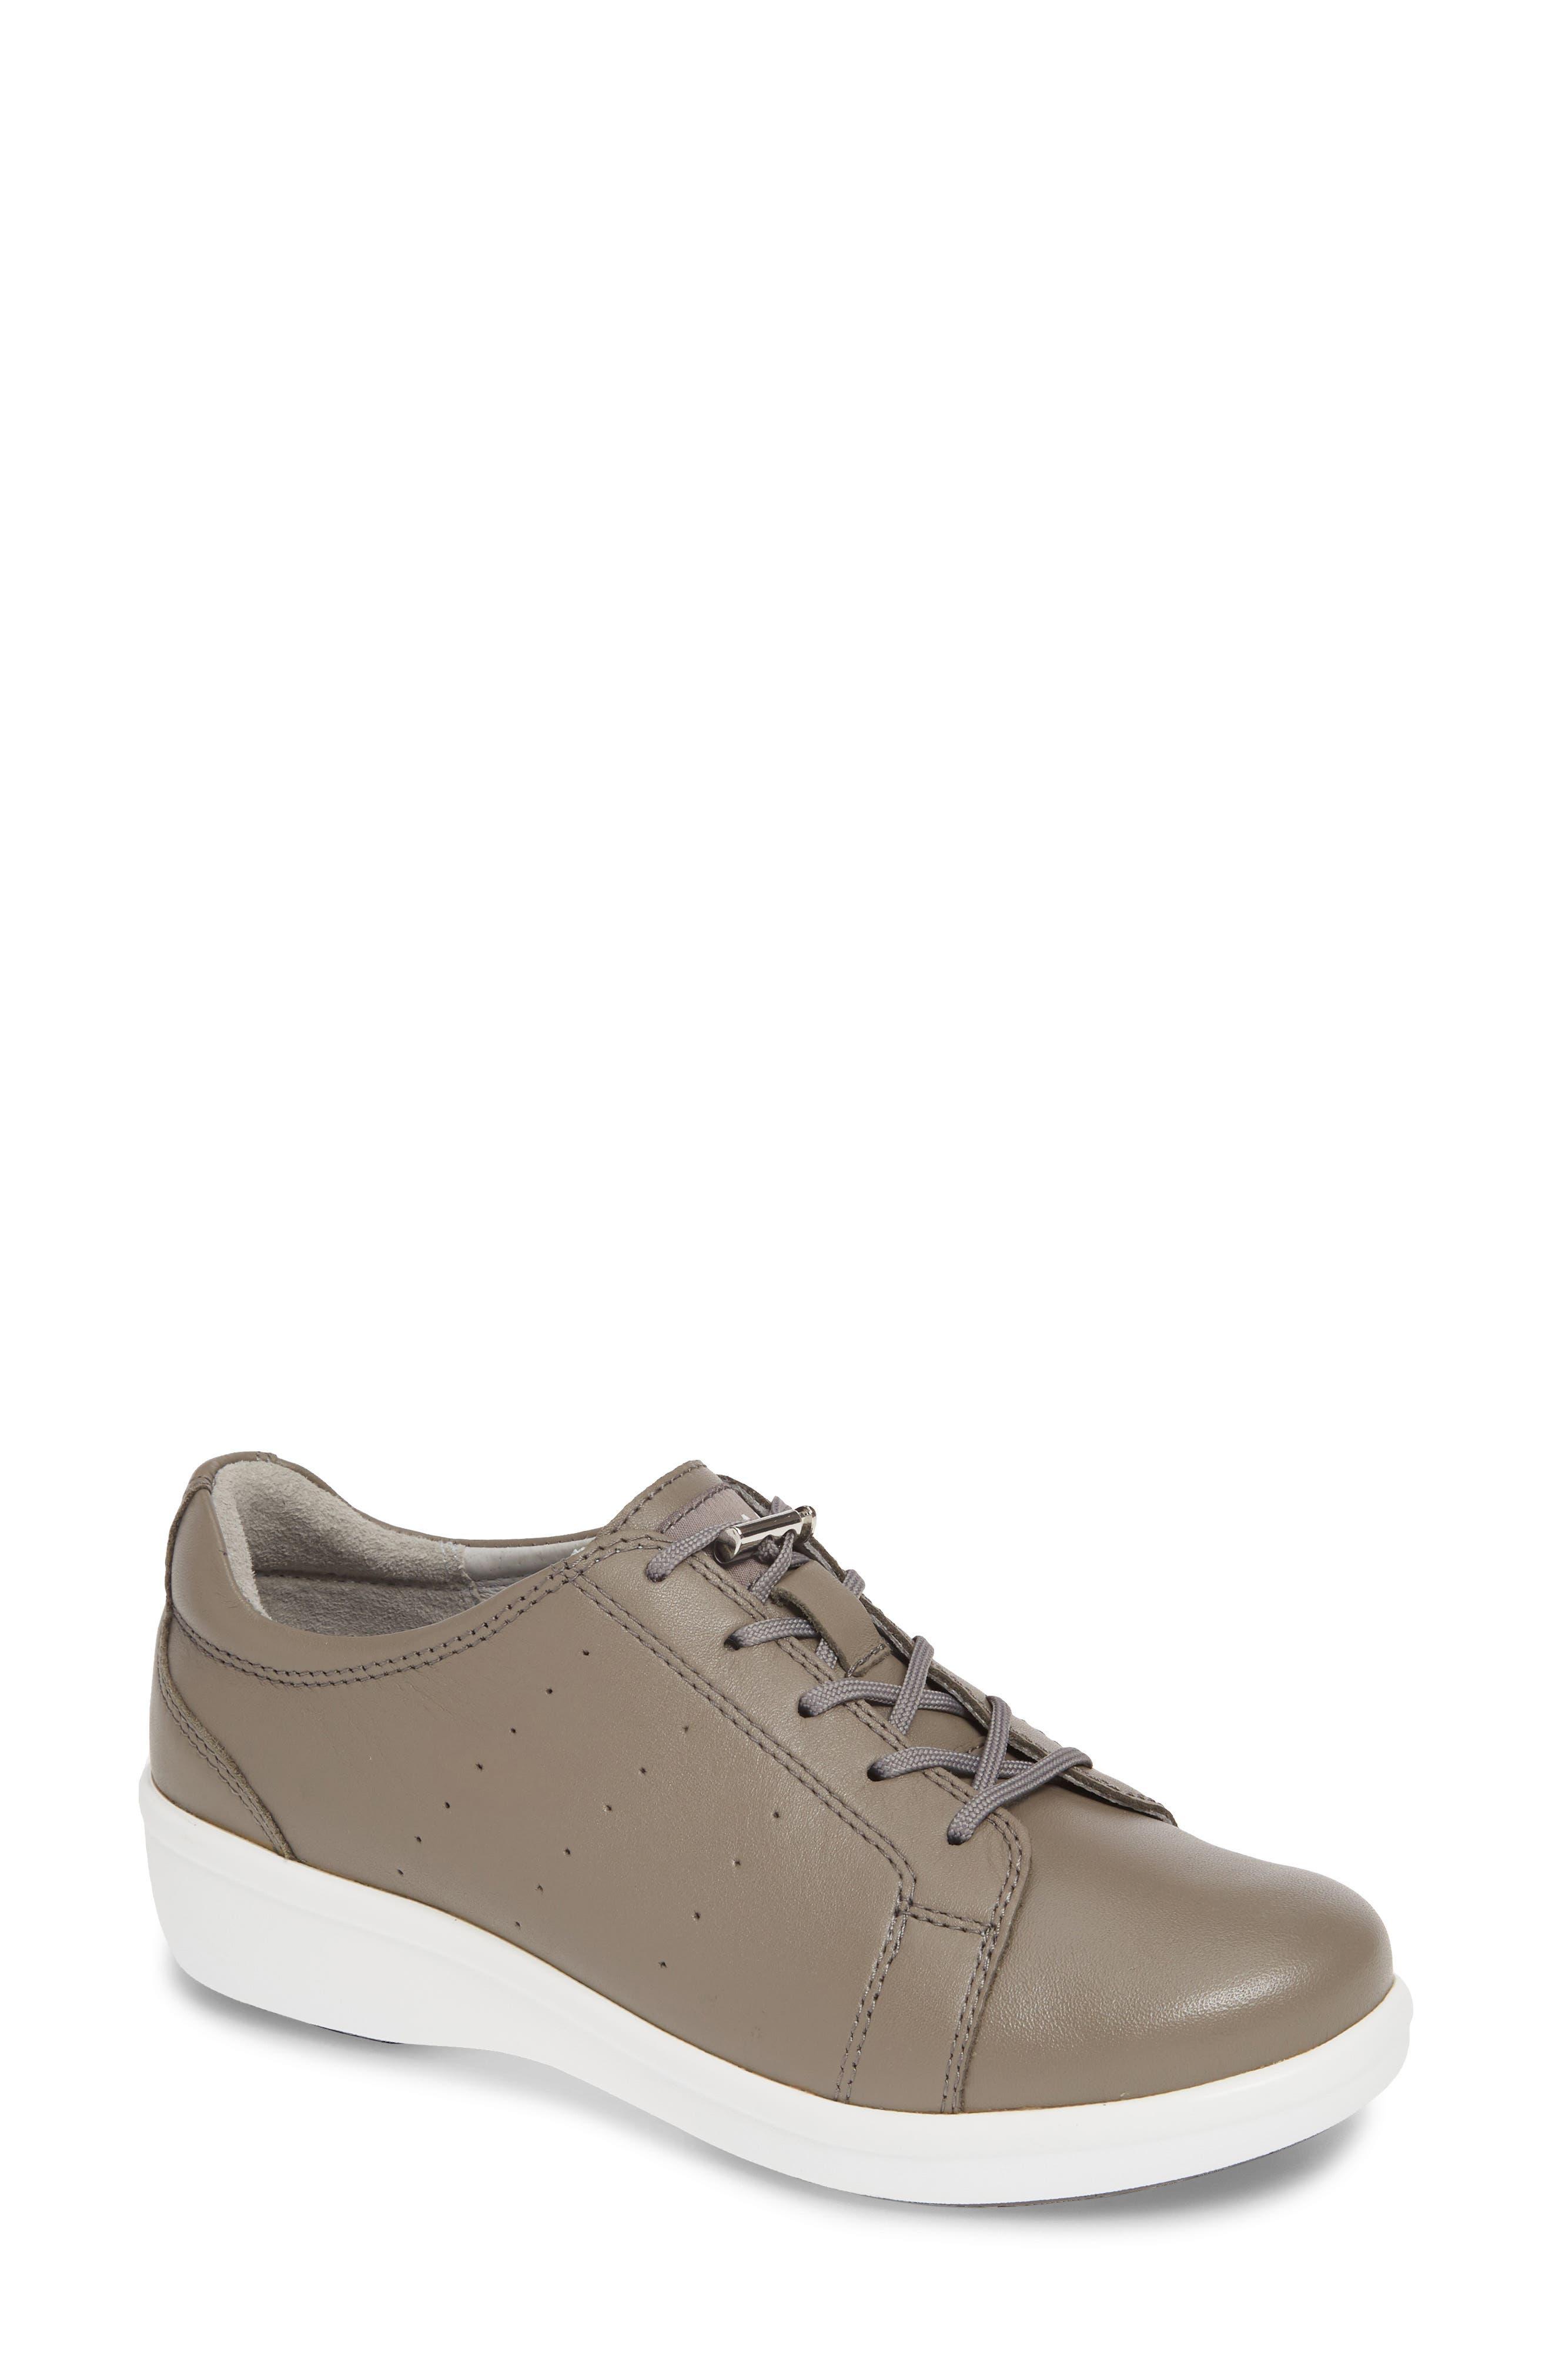 Alegria Cliq Sneaker - Grey